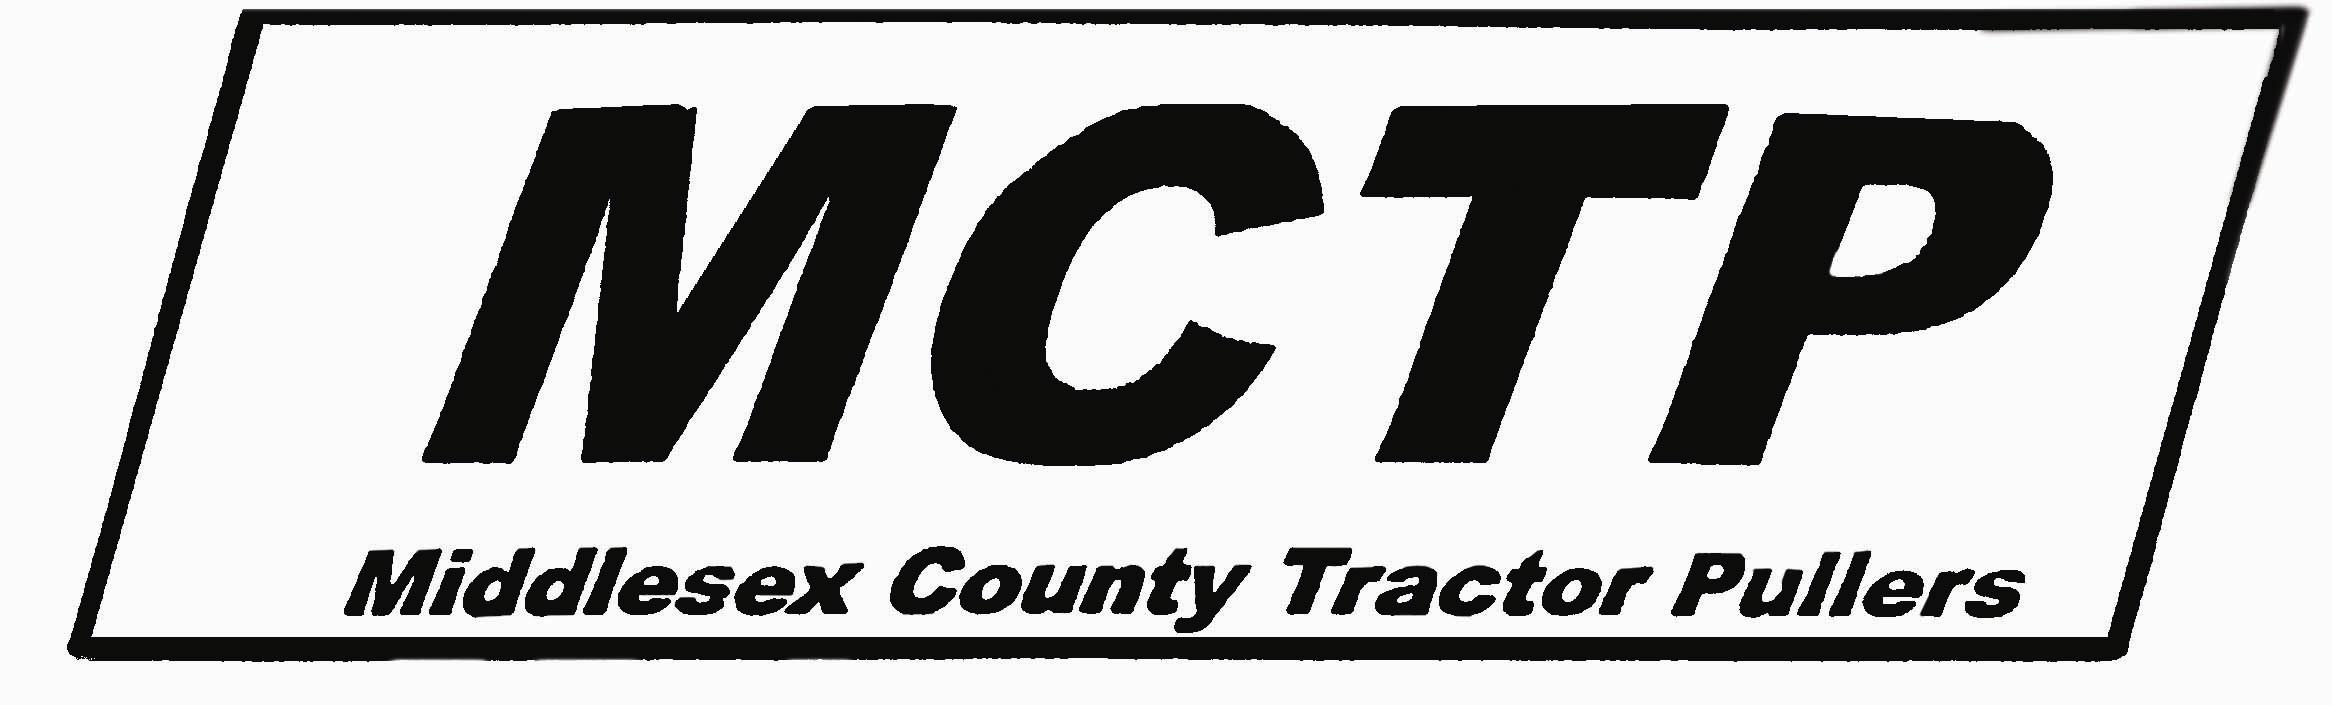 MCTP Logo copy